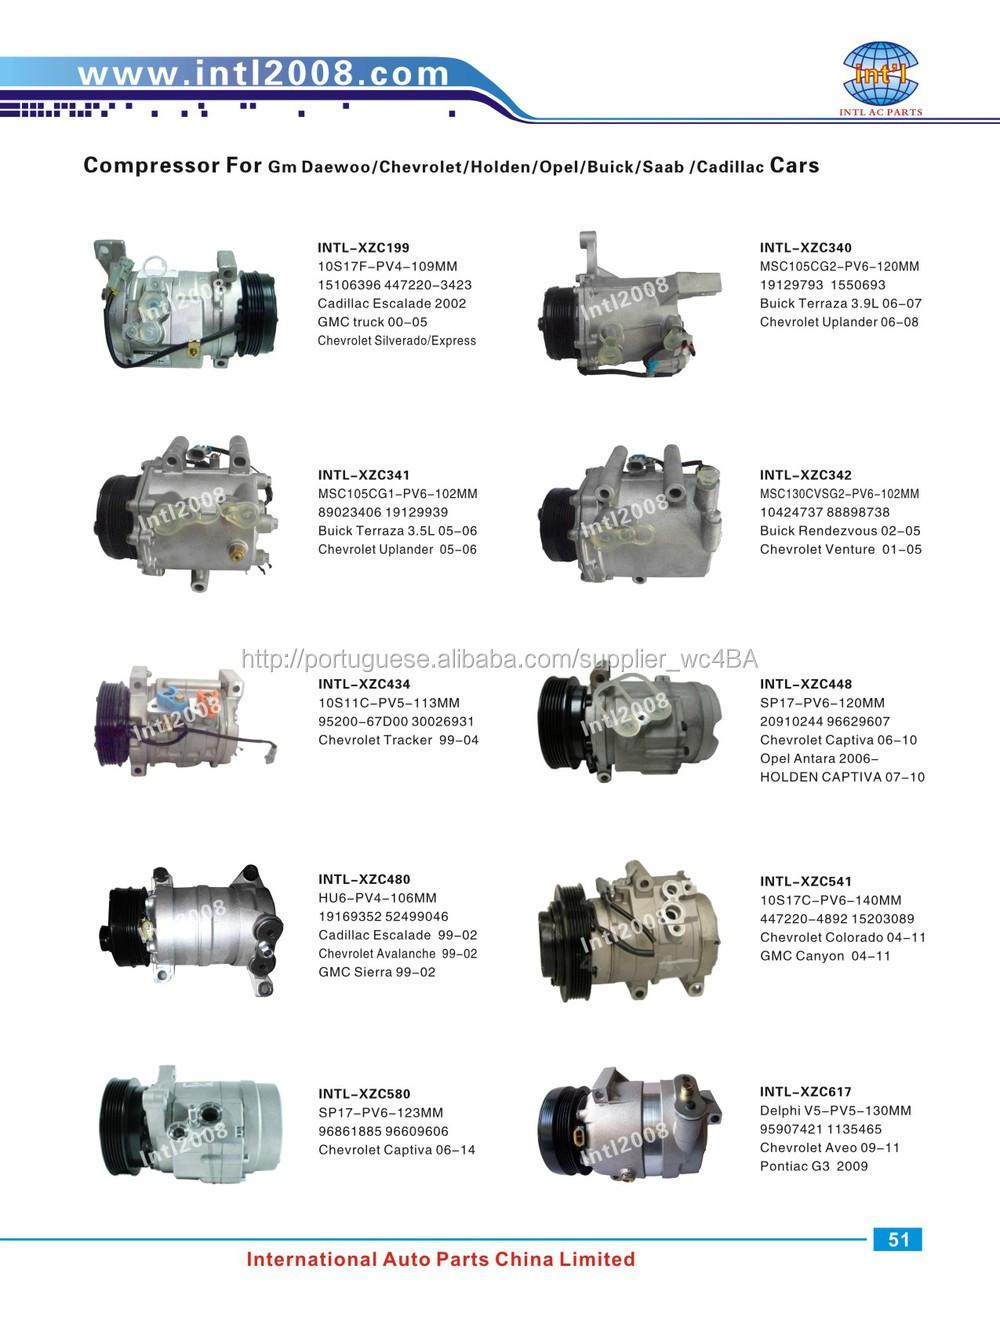 Denso 10s11e Auto Ac Compressor For Chevrolet Tracker Suzuki Colorado 3 5l Engine Parts Diagram Gm Daewoo Opel Buick Saab Cadillac 1 51